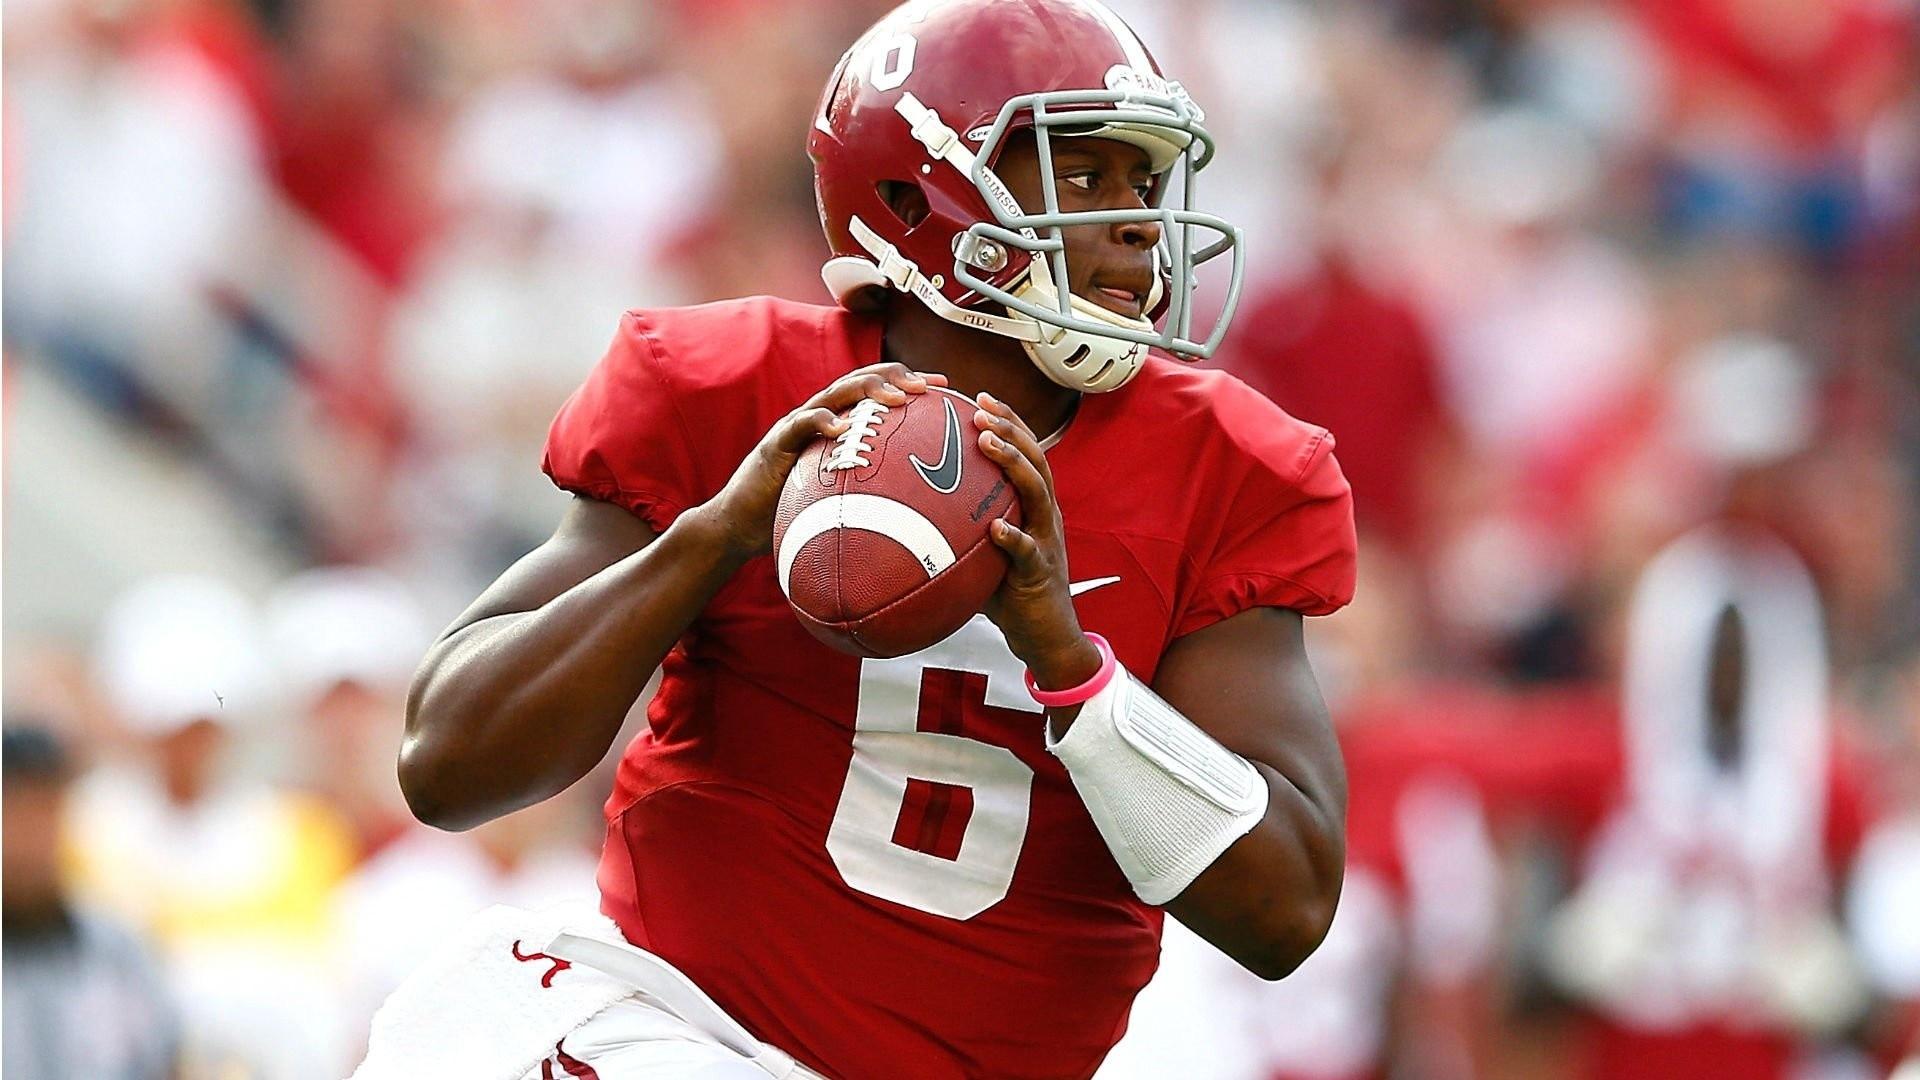 Football, College, Crimson Tide, Alabama Football Players, Alabama Football  Crimson Tide,